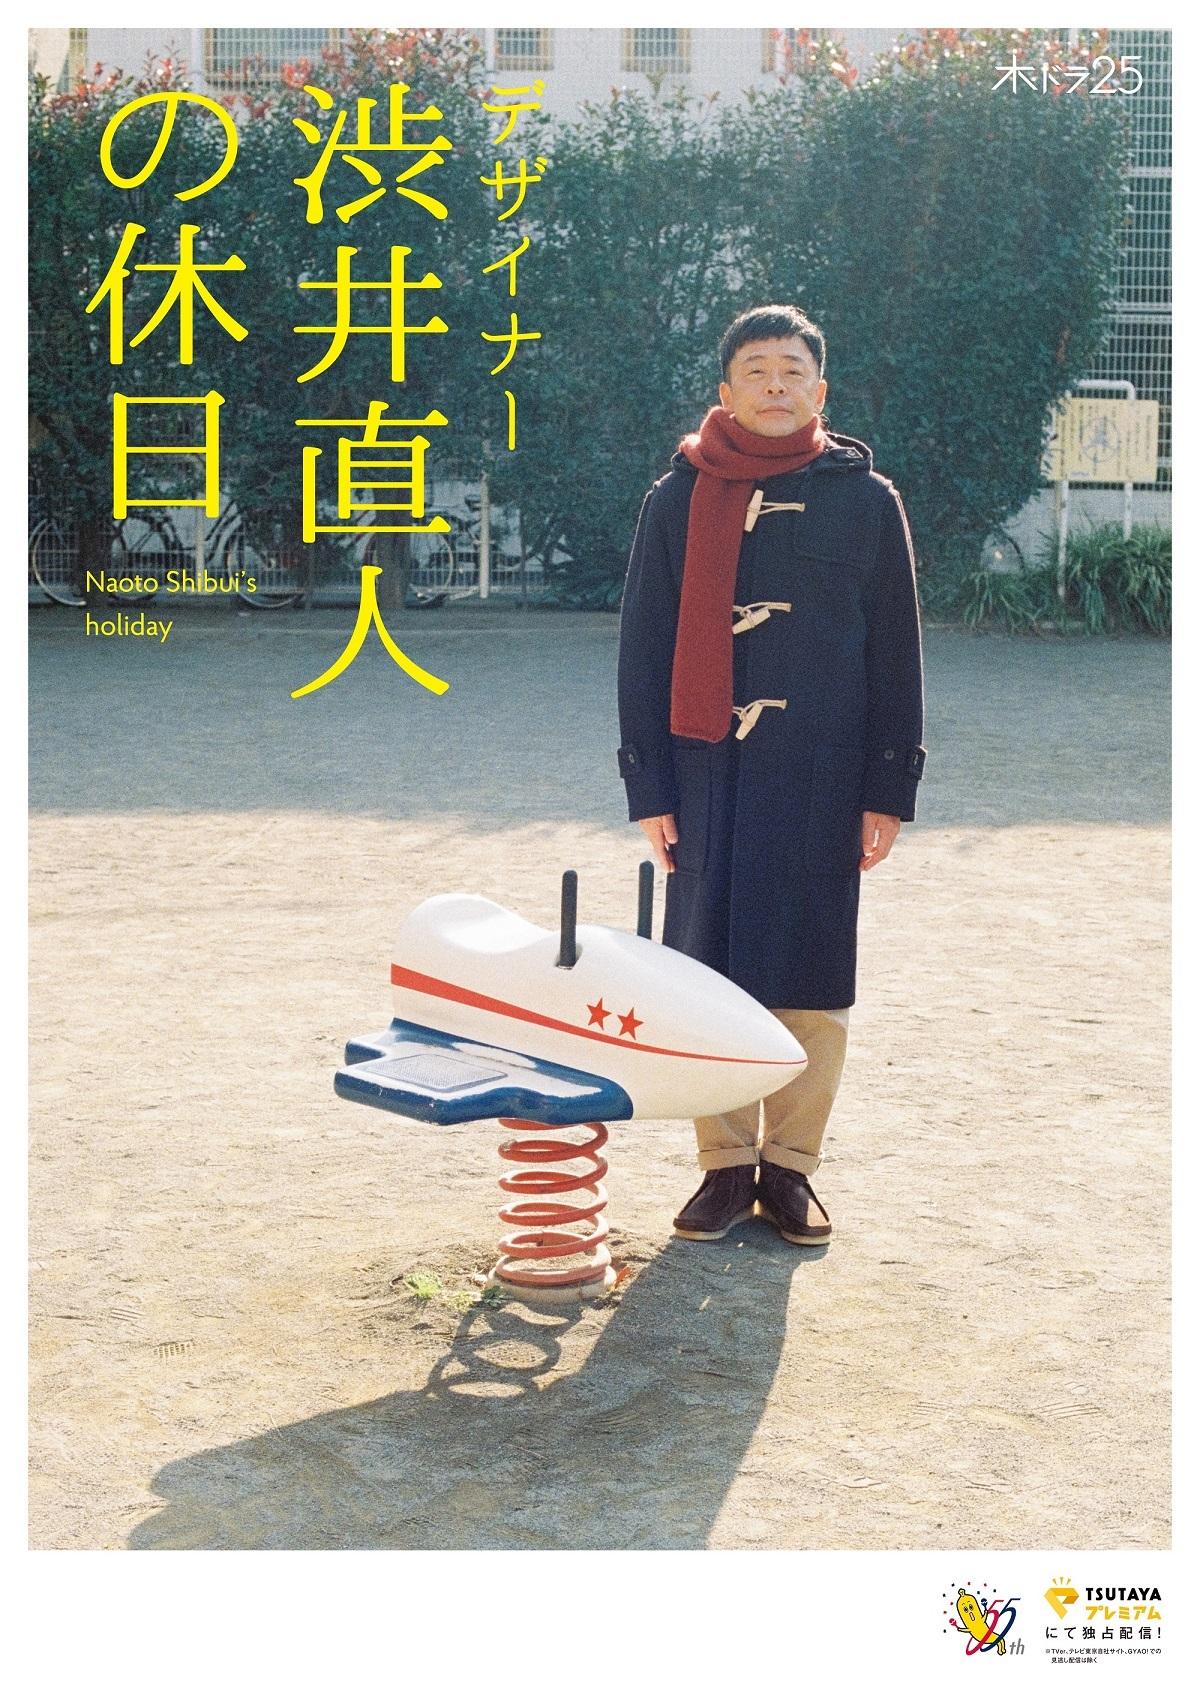 Ⓒ渋谷直角/宝島社 Ⓒ「デザイナー 渋井直人の休日」製作委員会